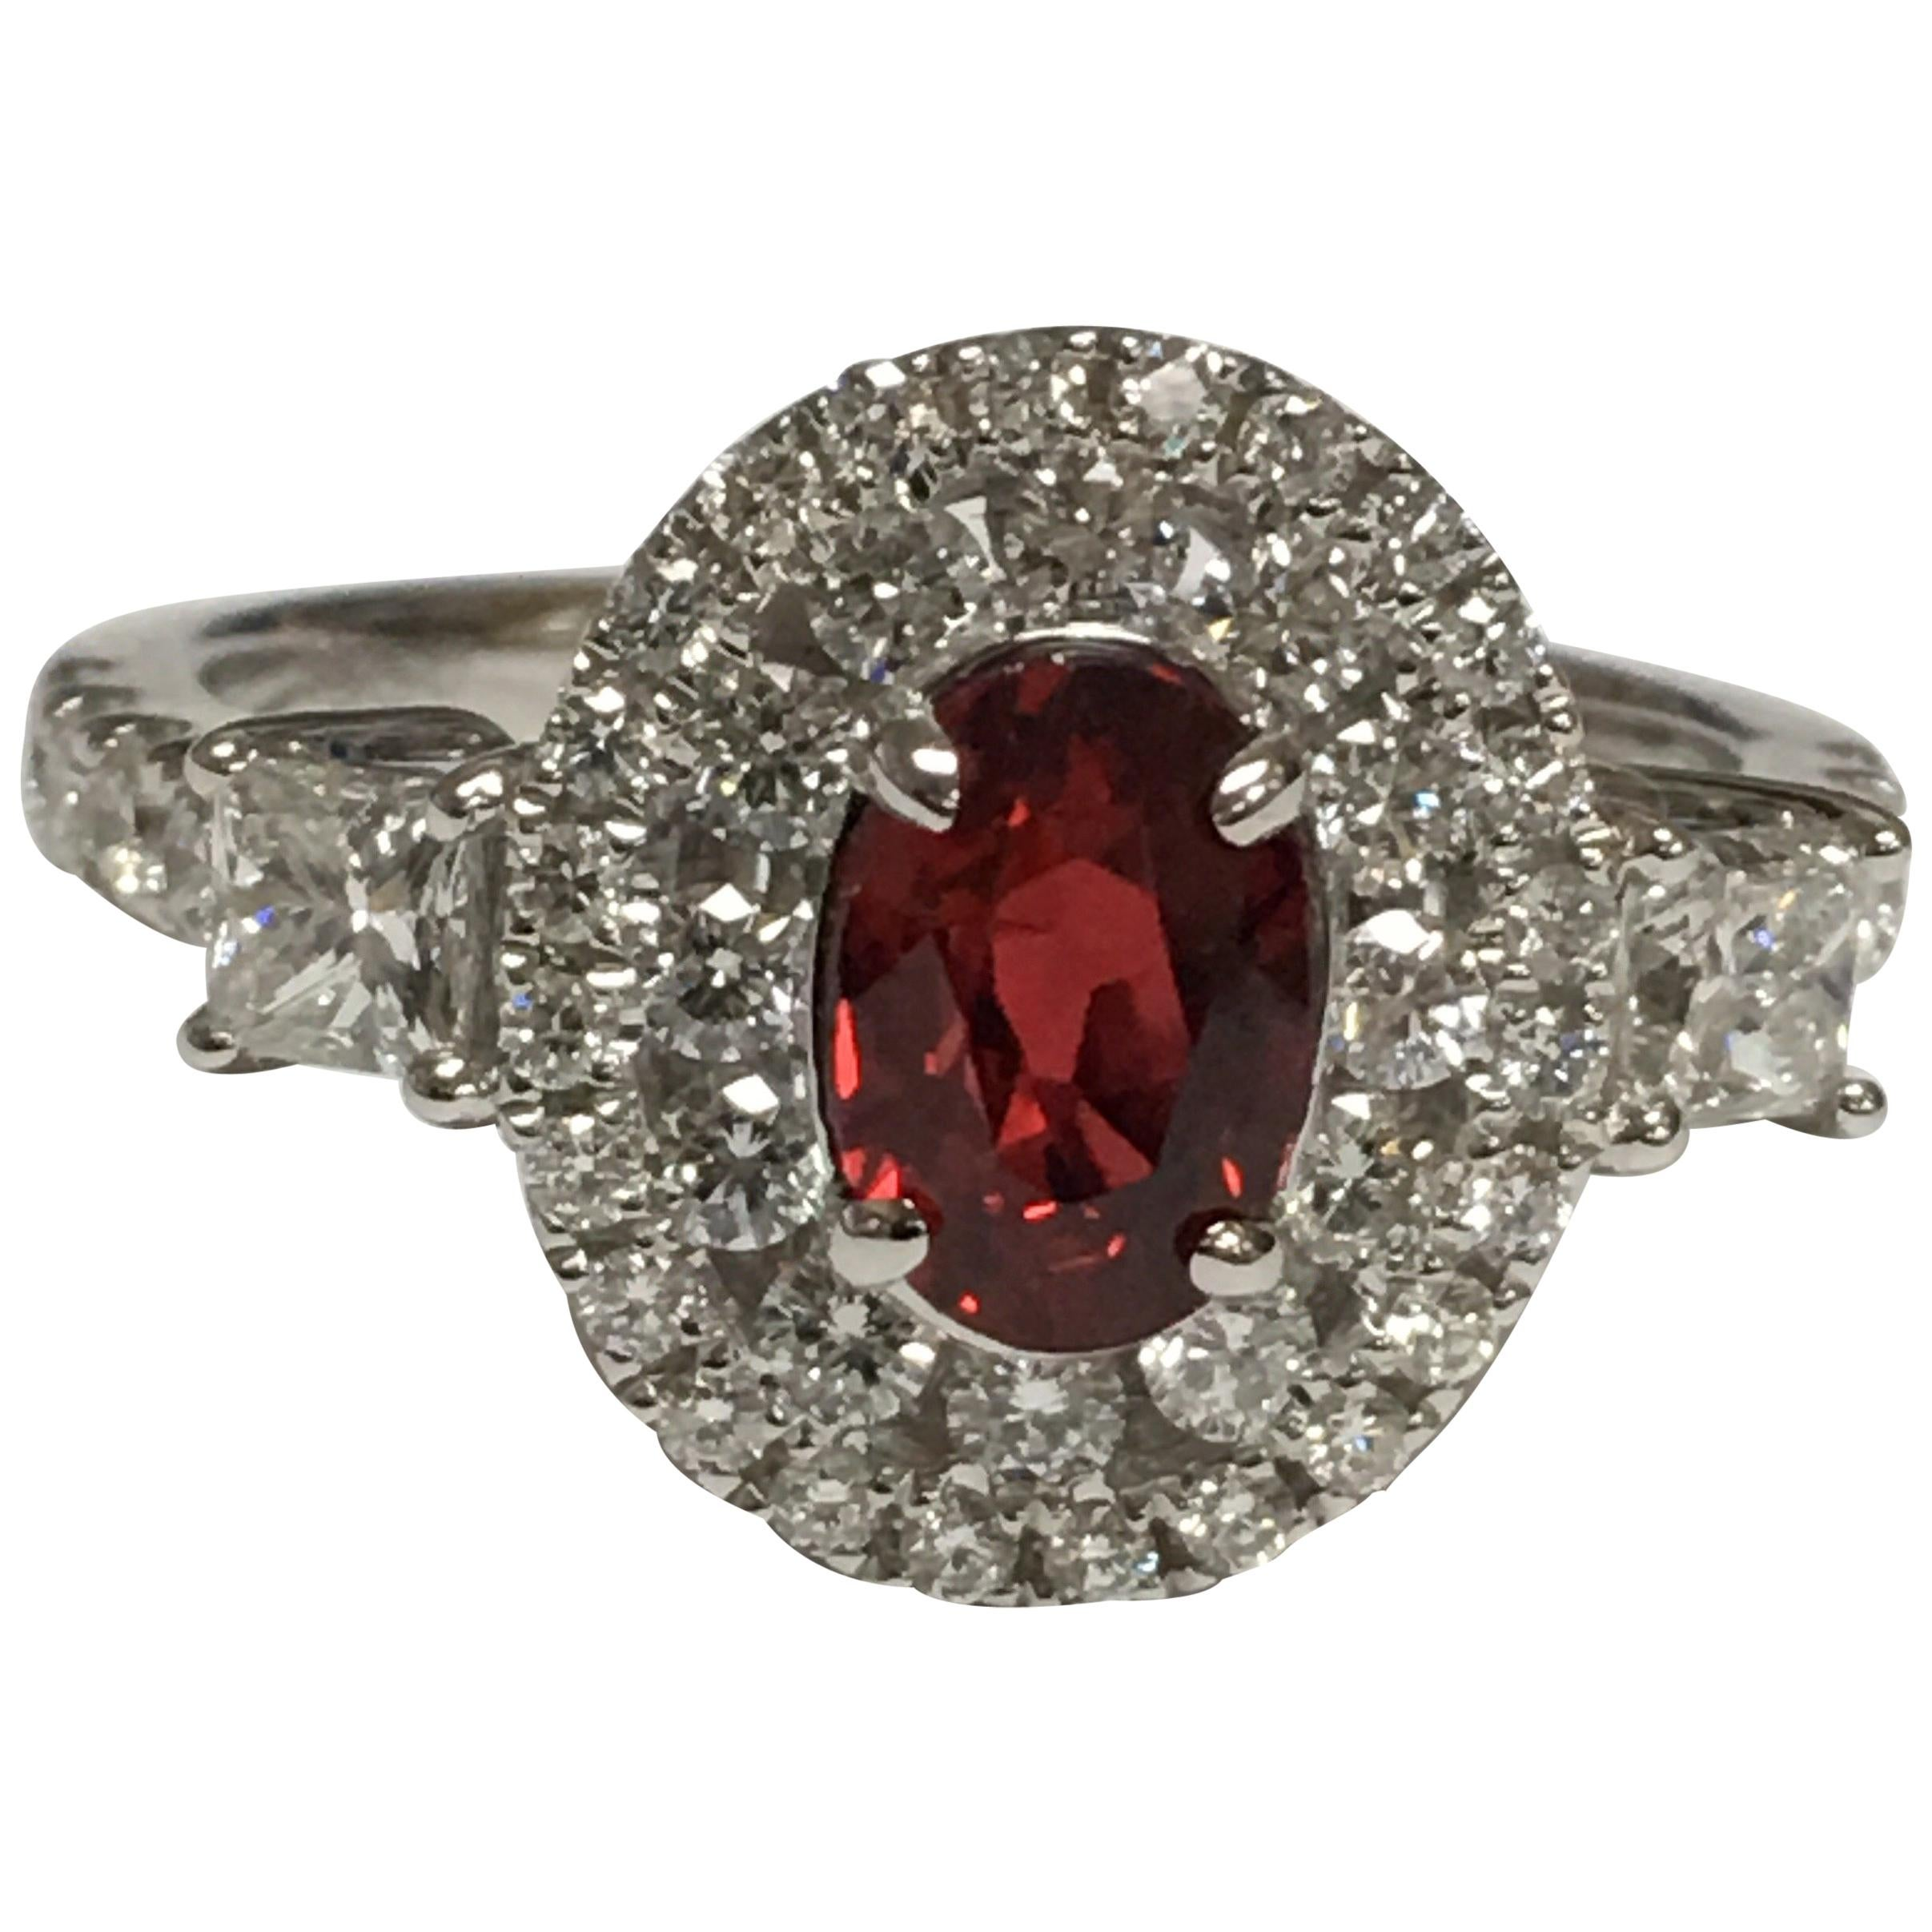 GIA Certified 1.06 Carat Ruby Diamond Engagement Ring